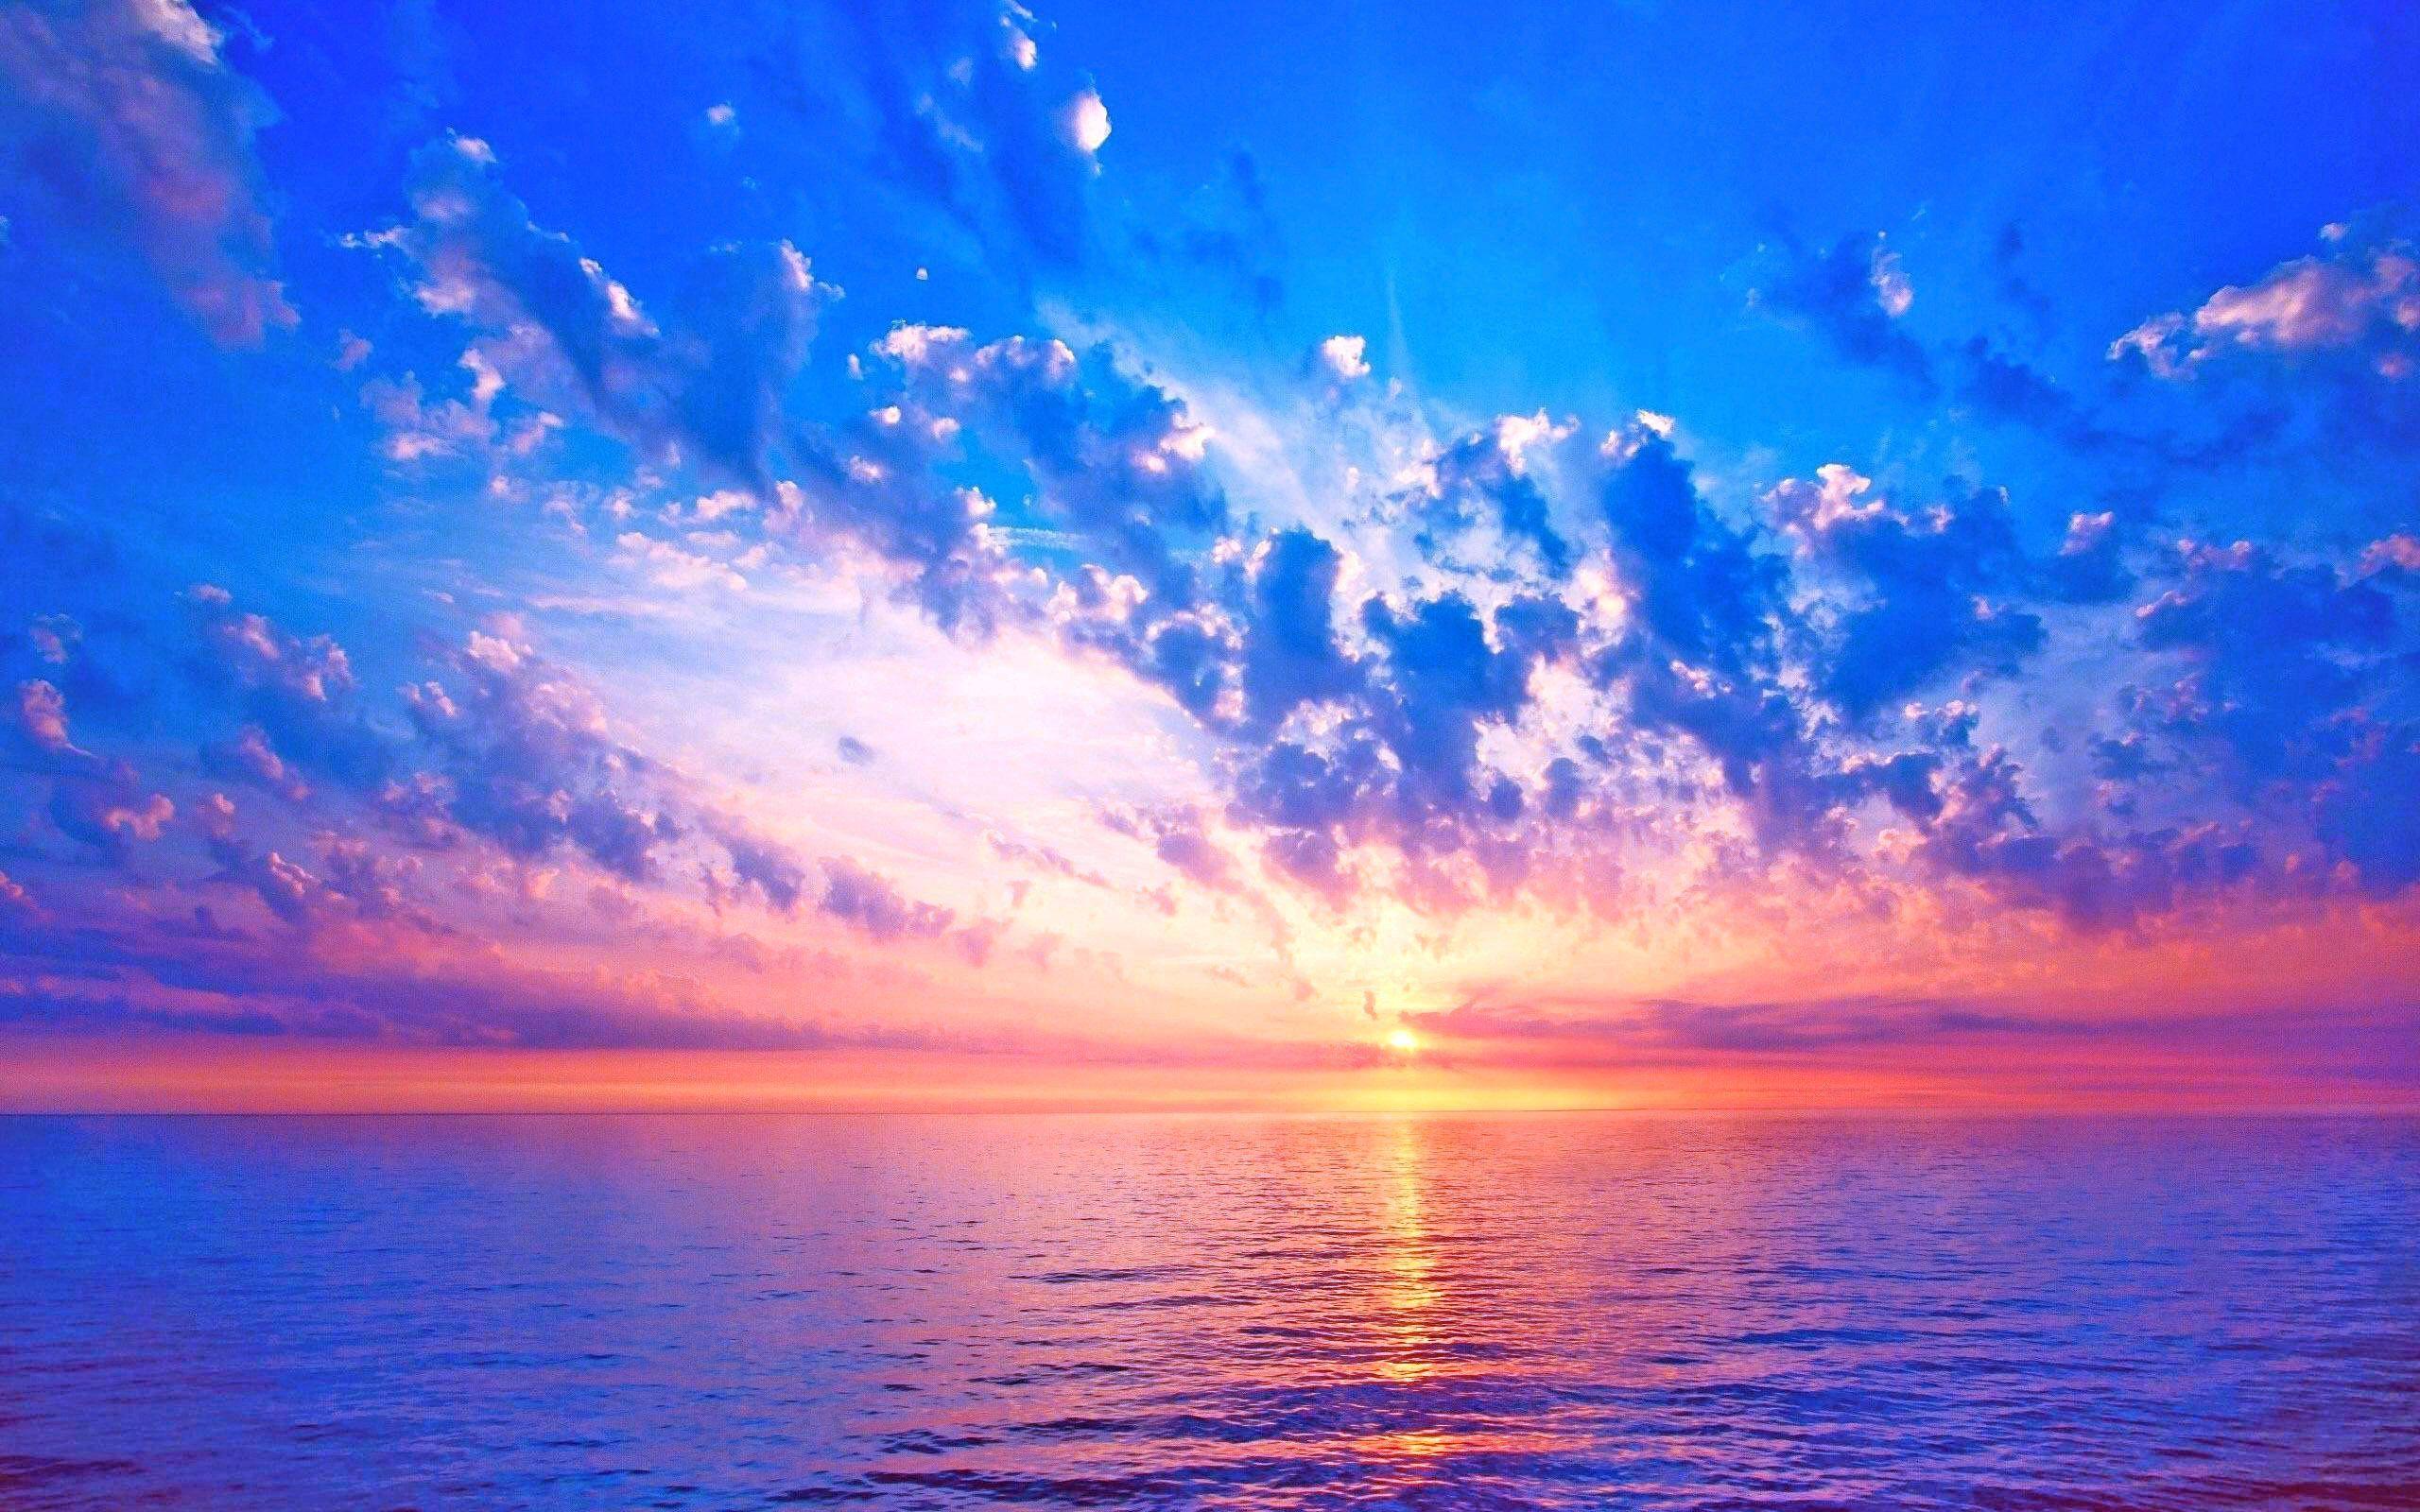 Beach Sunset Image Dekstop Best Hd Wallp Sunrise Pictures Sunrise Wallpaper Blue Sky Wallpaper Hd wallpaper sea sunset clouds sky